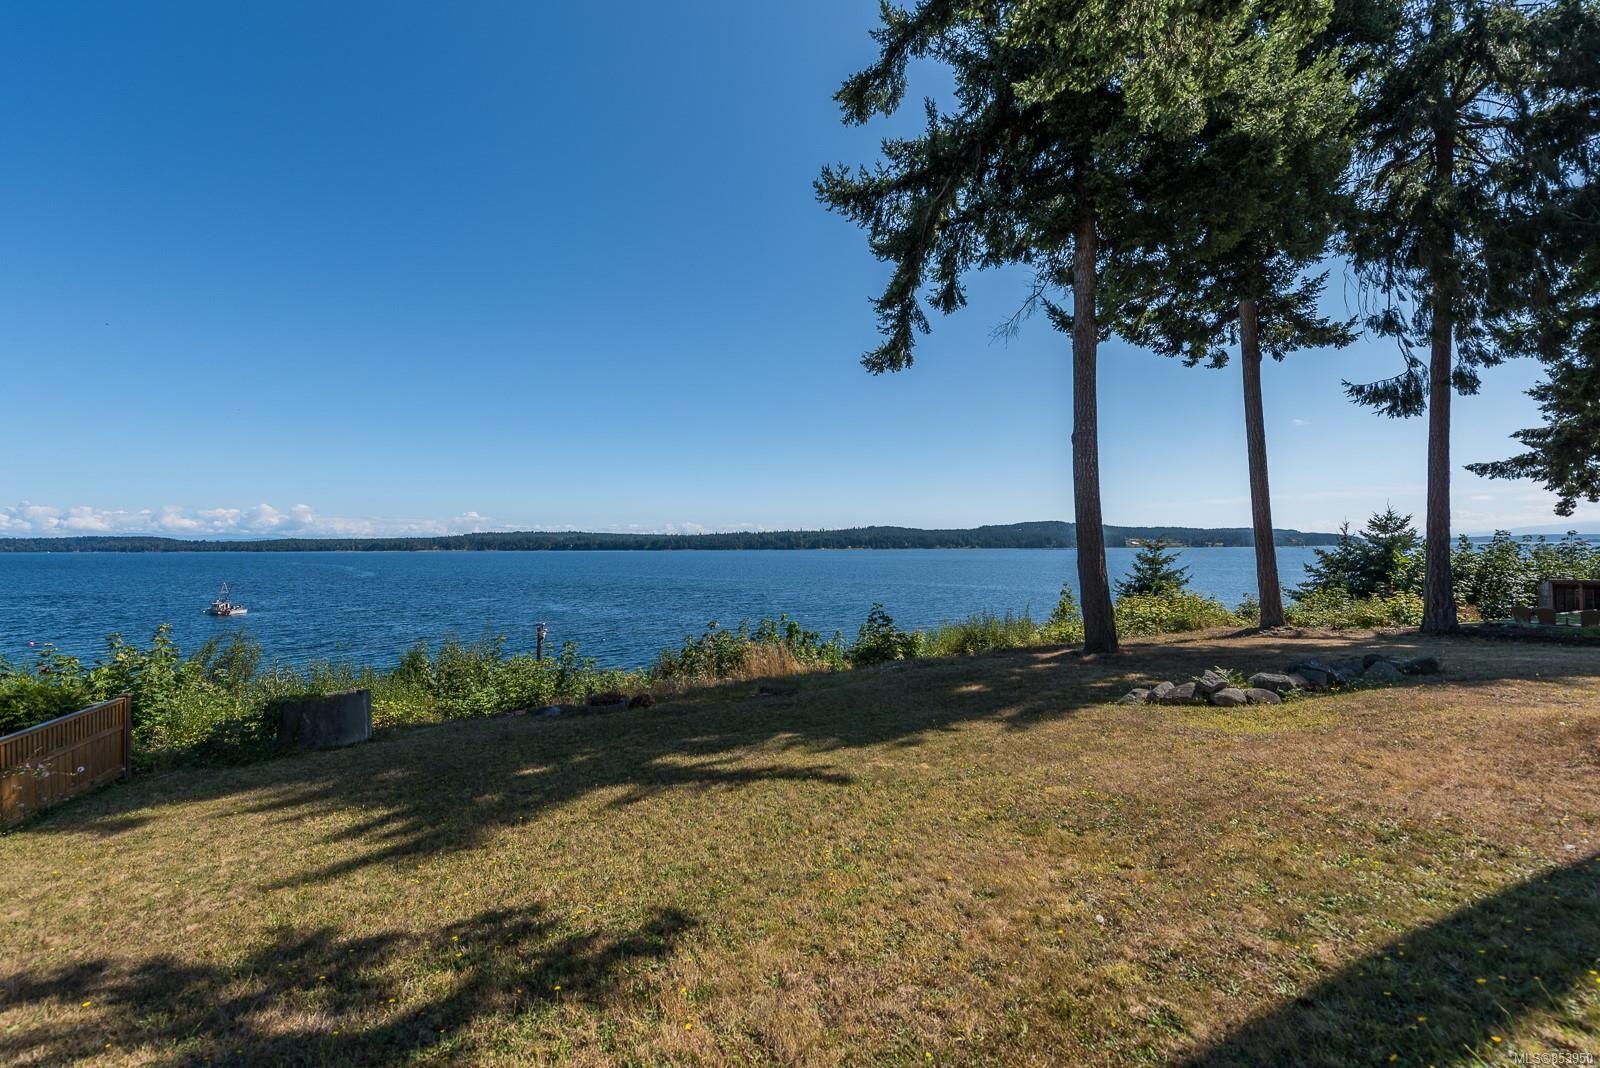 Photo 10: Photos: 5880 GARVIN Rd in : CV Union Bay/Fanny Bay House for sale (Comox Valley)  : MLS®# 853950